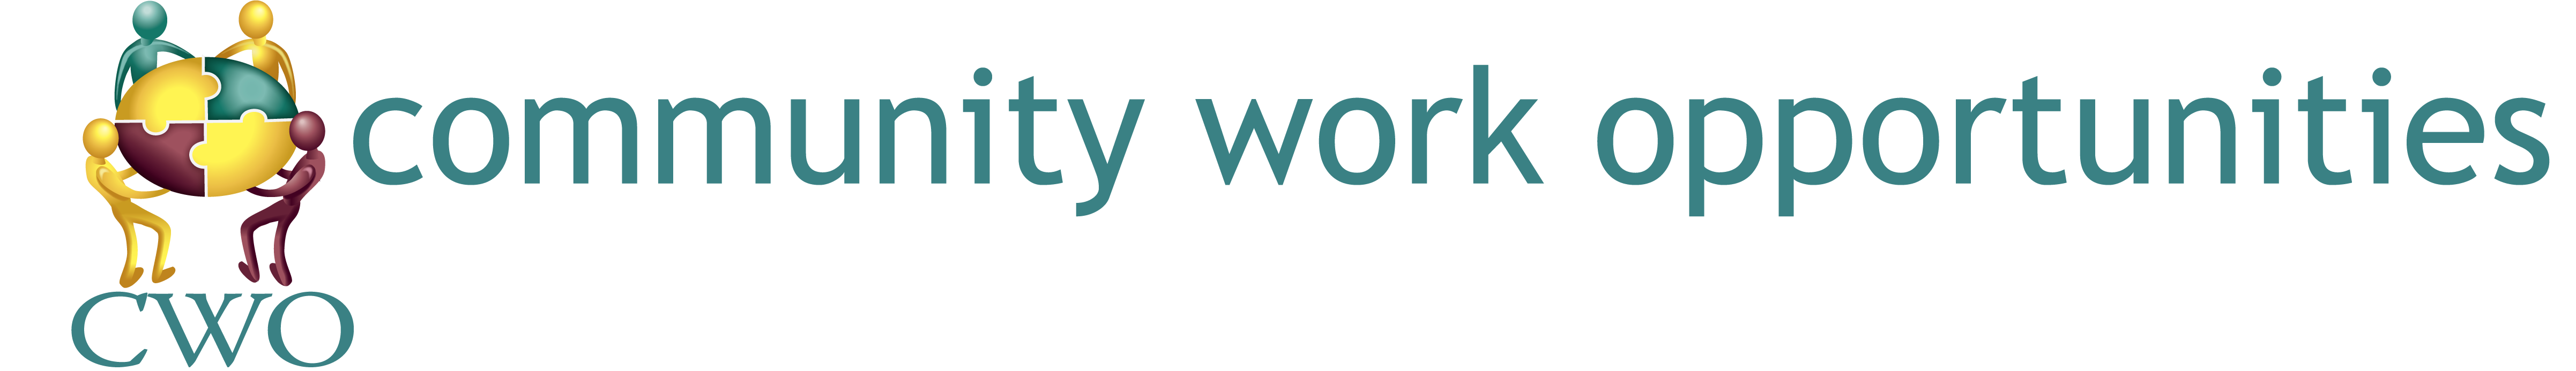 Community Work Opportunities